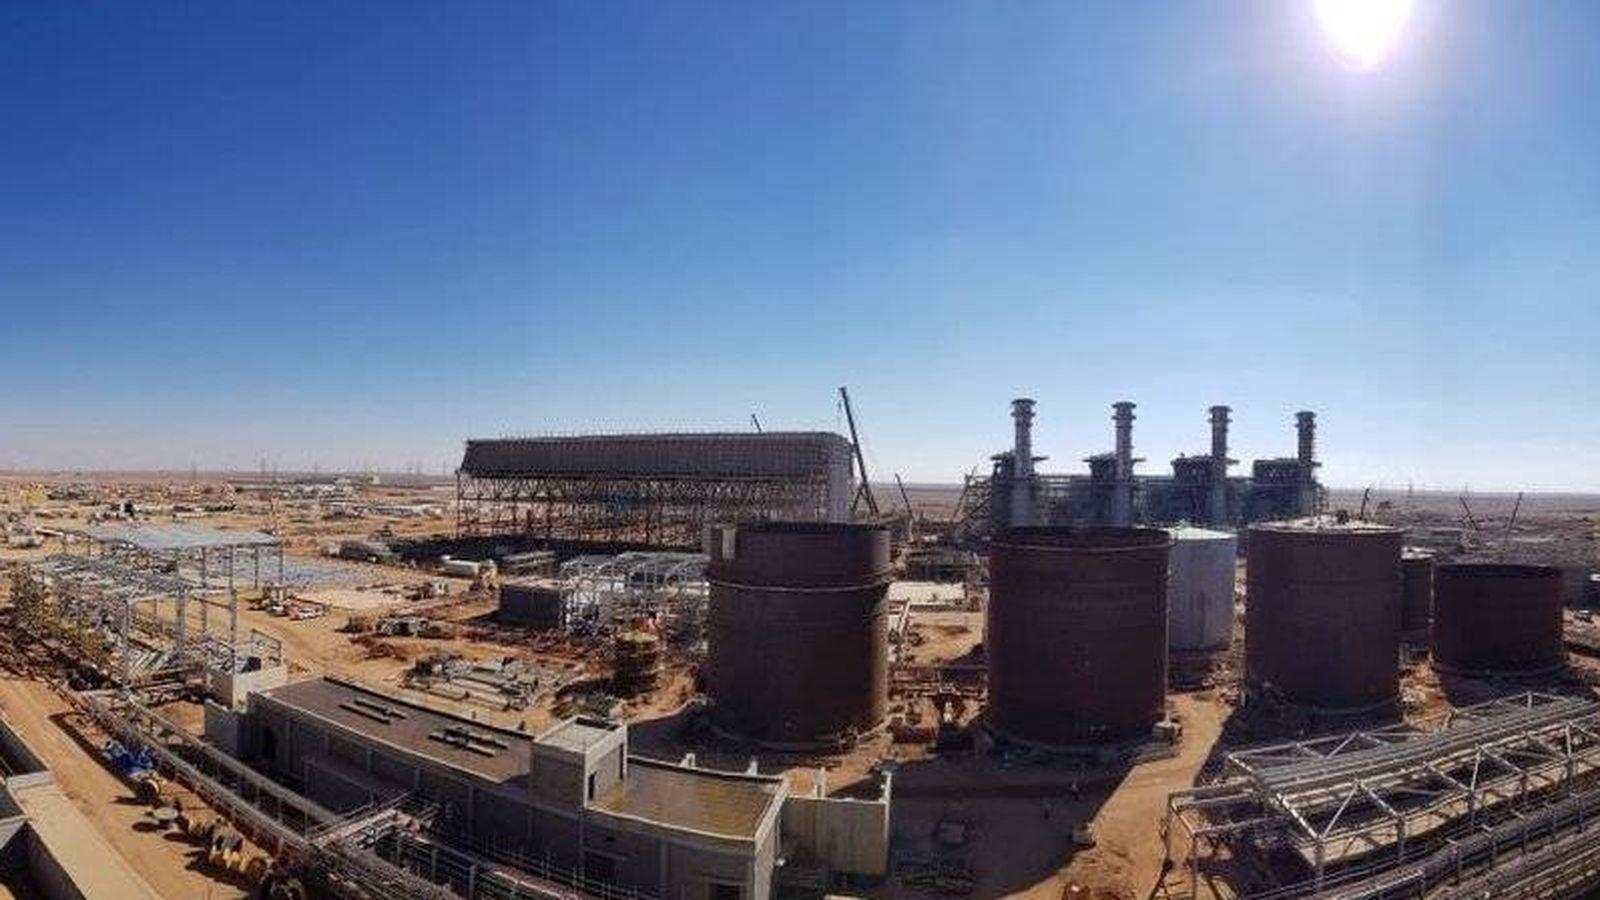 Foto: Obras de la central de Waad Al Shamal en Arabia. (Abengoa)